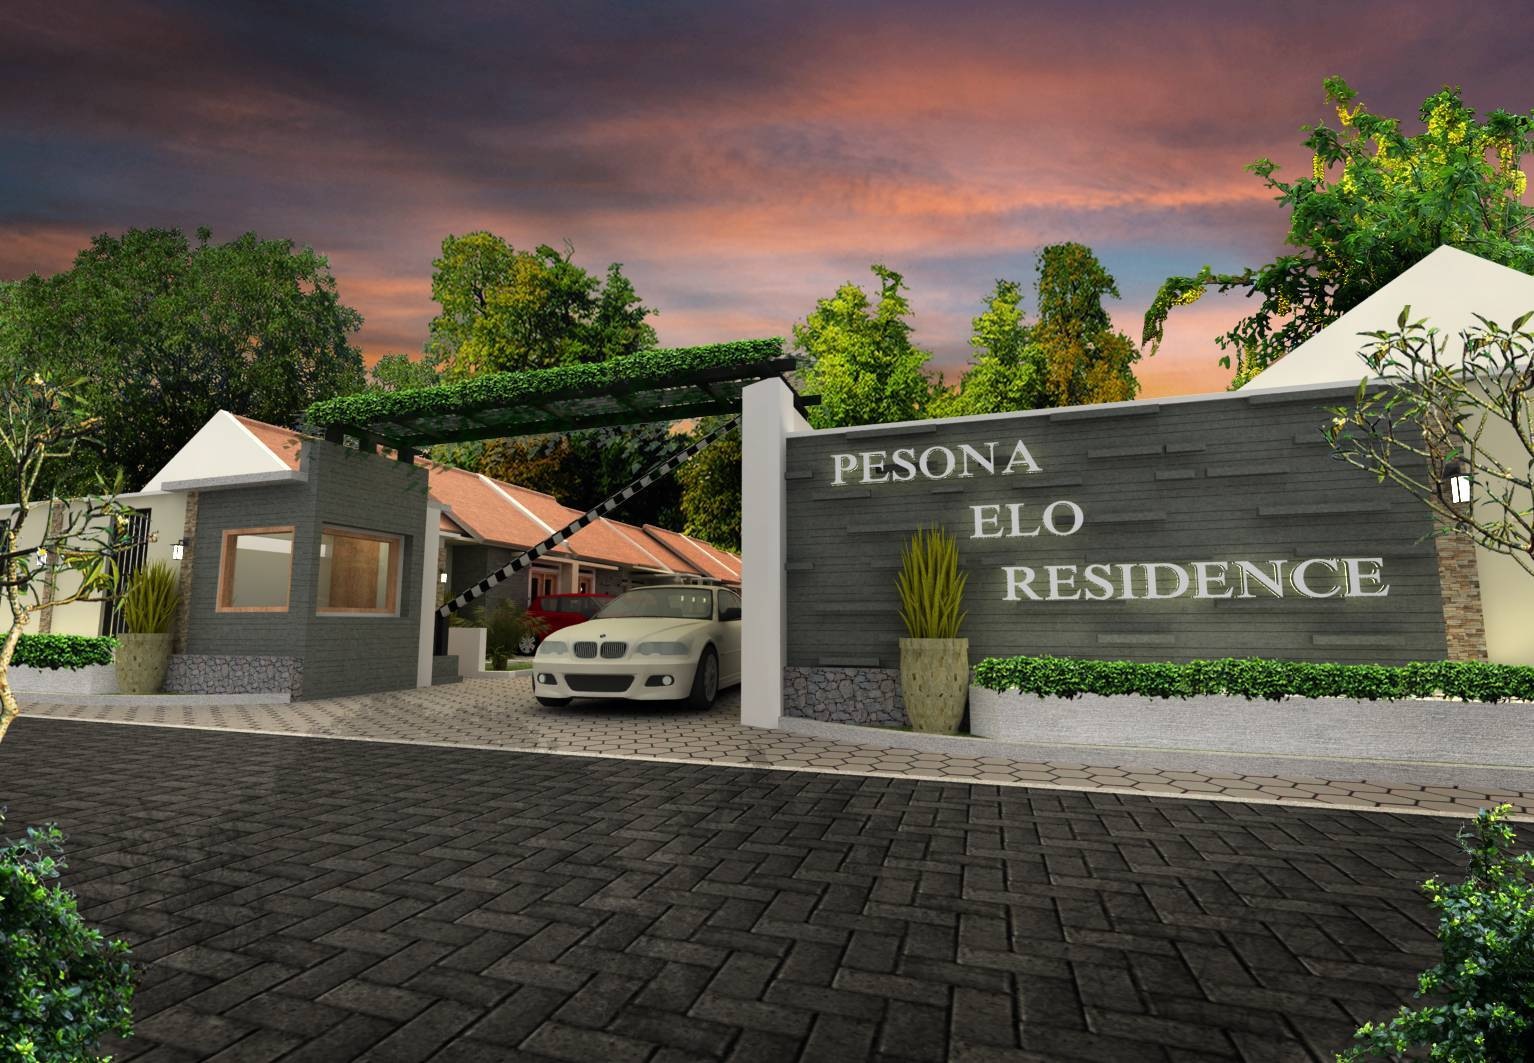 Pt. Fectic Maha Karya Pesona Elo Residence Magelang, Middle Java, Indonesia Magelang, Middle Java, Indonesia Main-Gate   5011